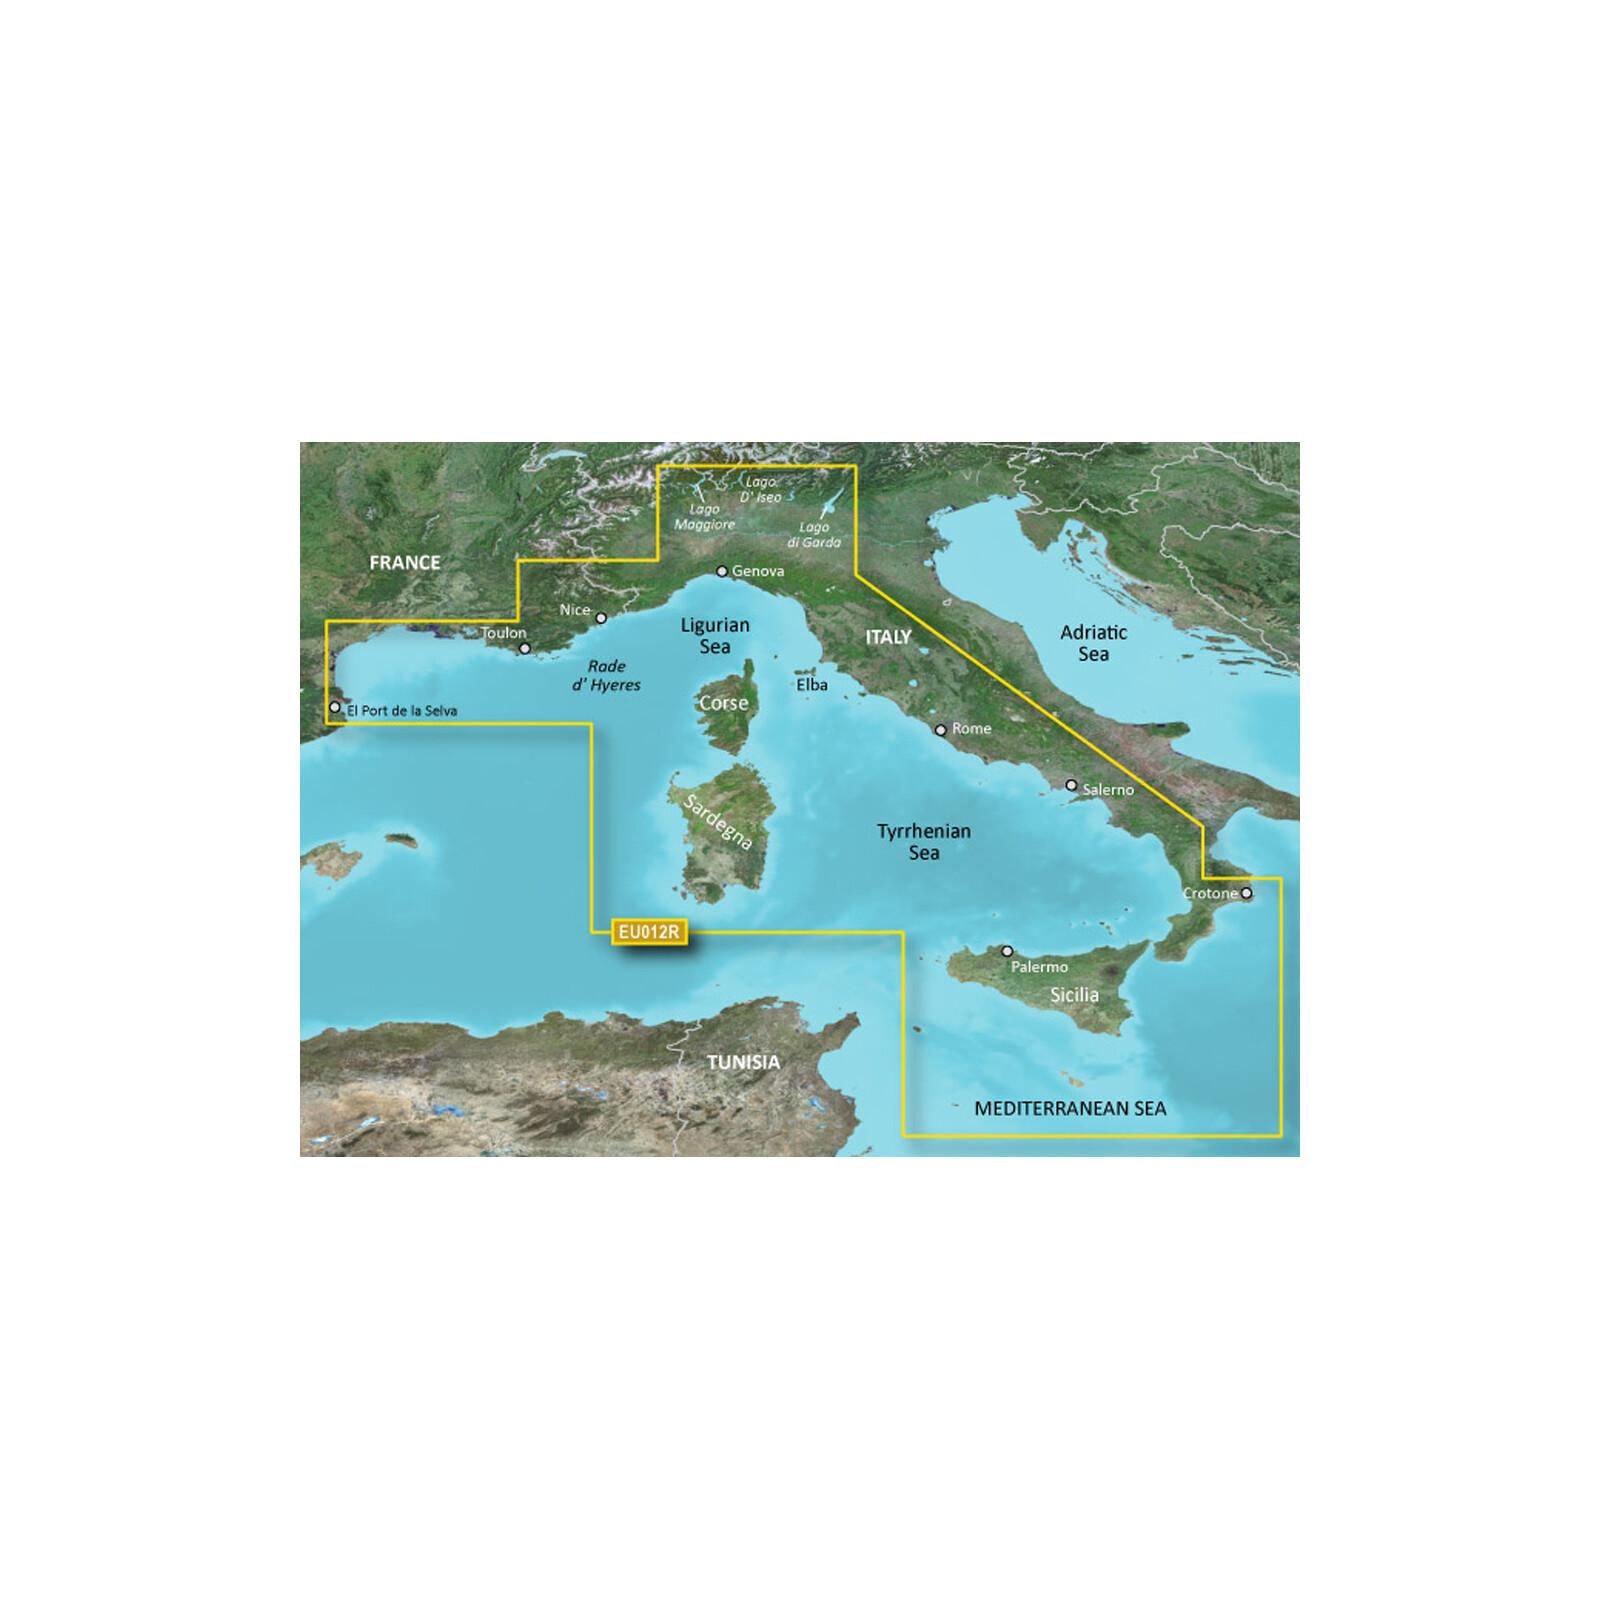 Garmin HXEU012R - Mediterranean Sea, Central-West mSD